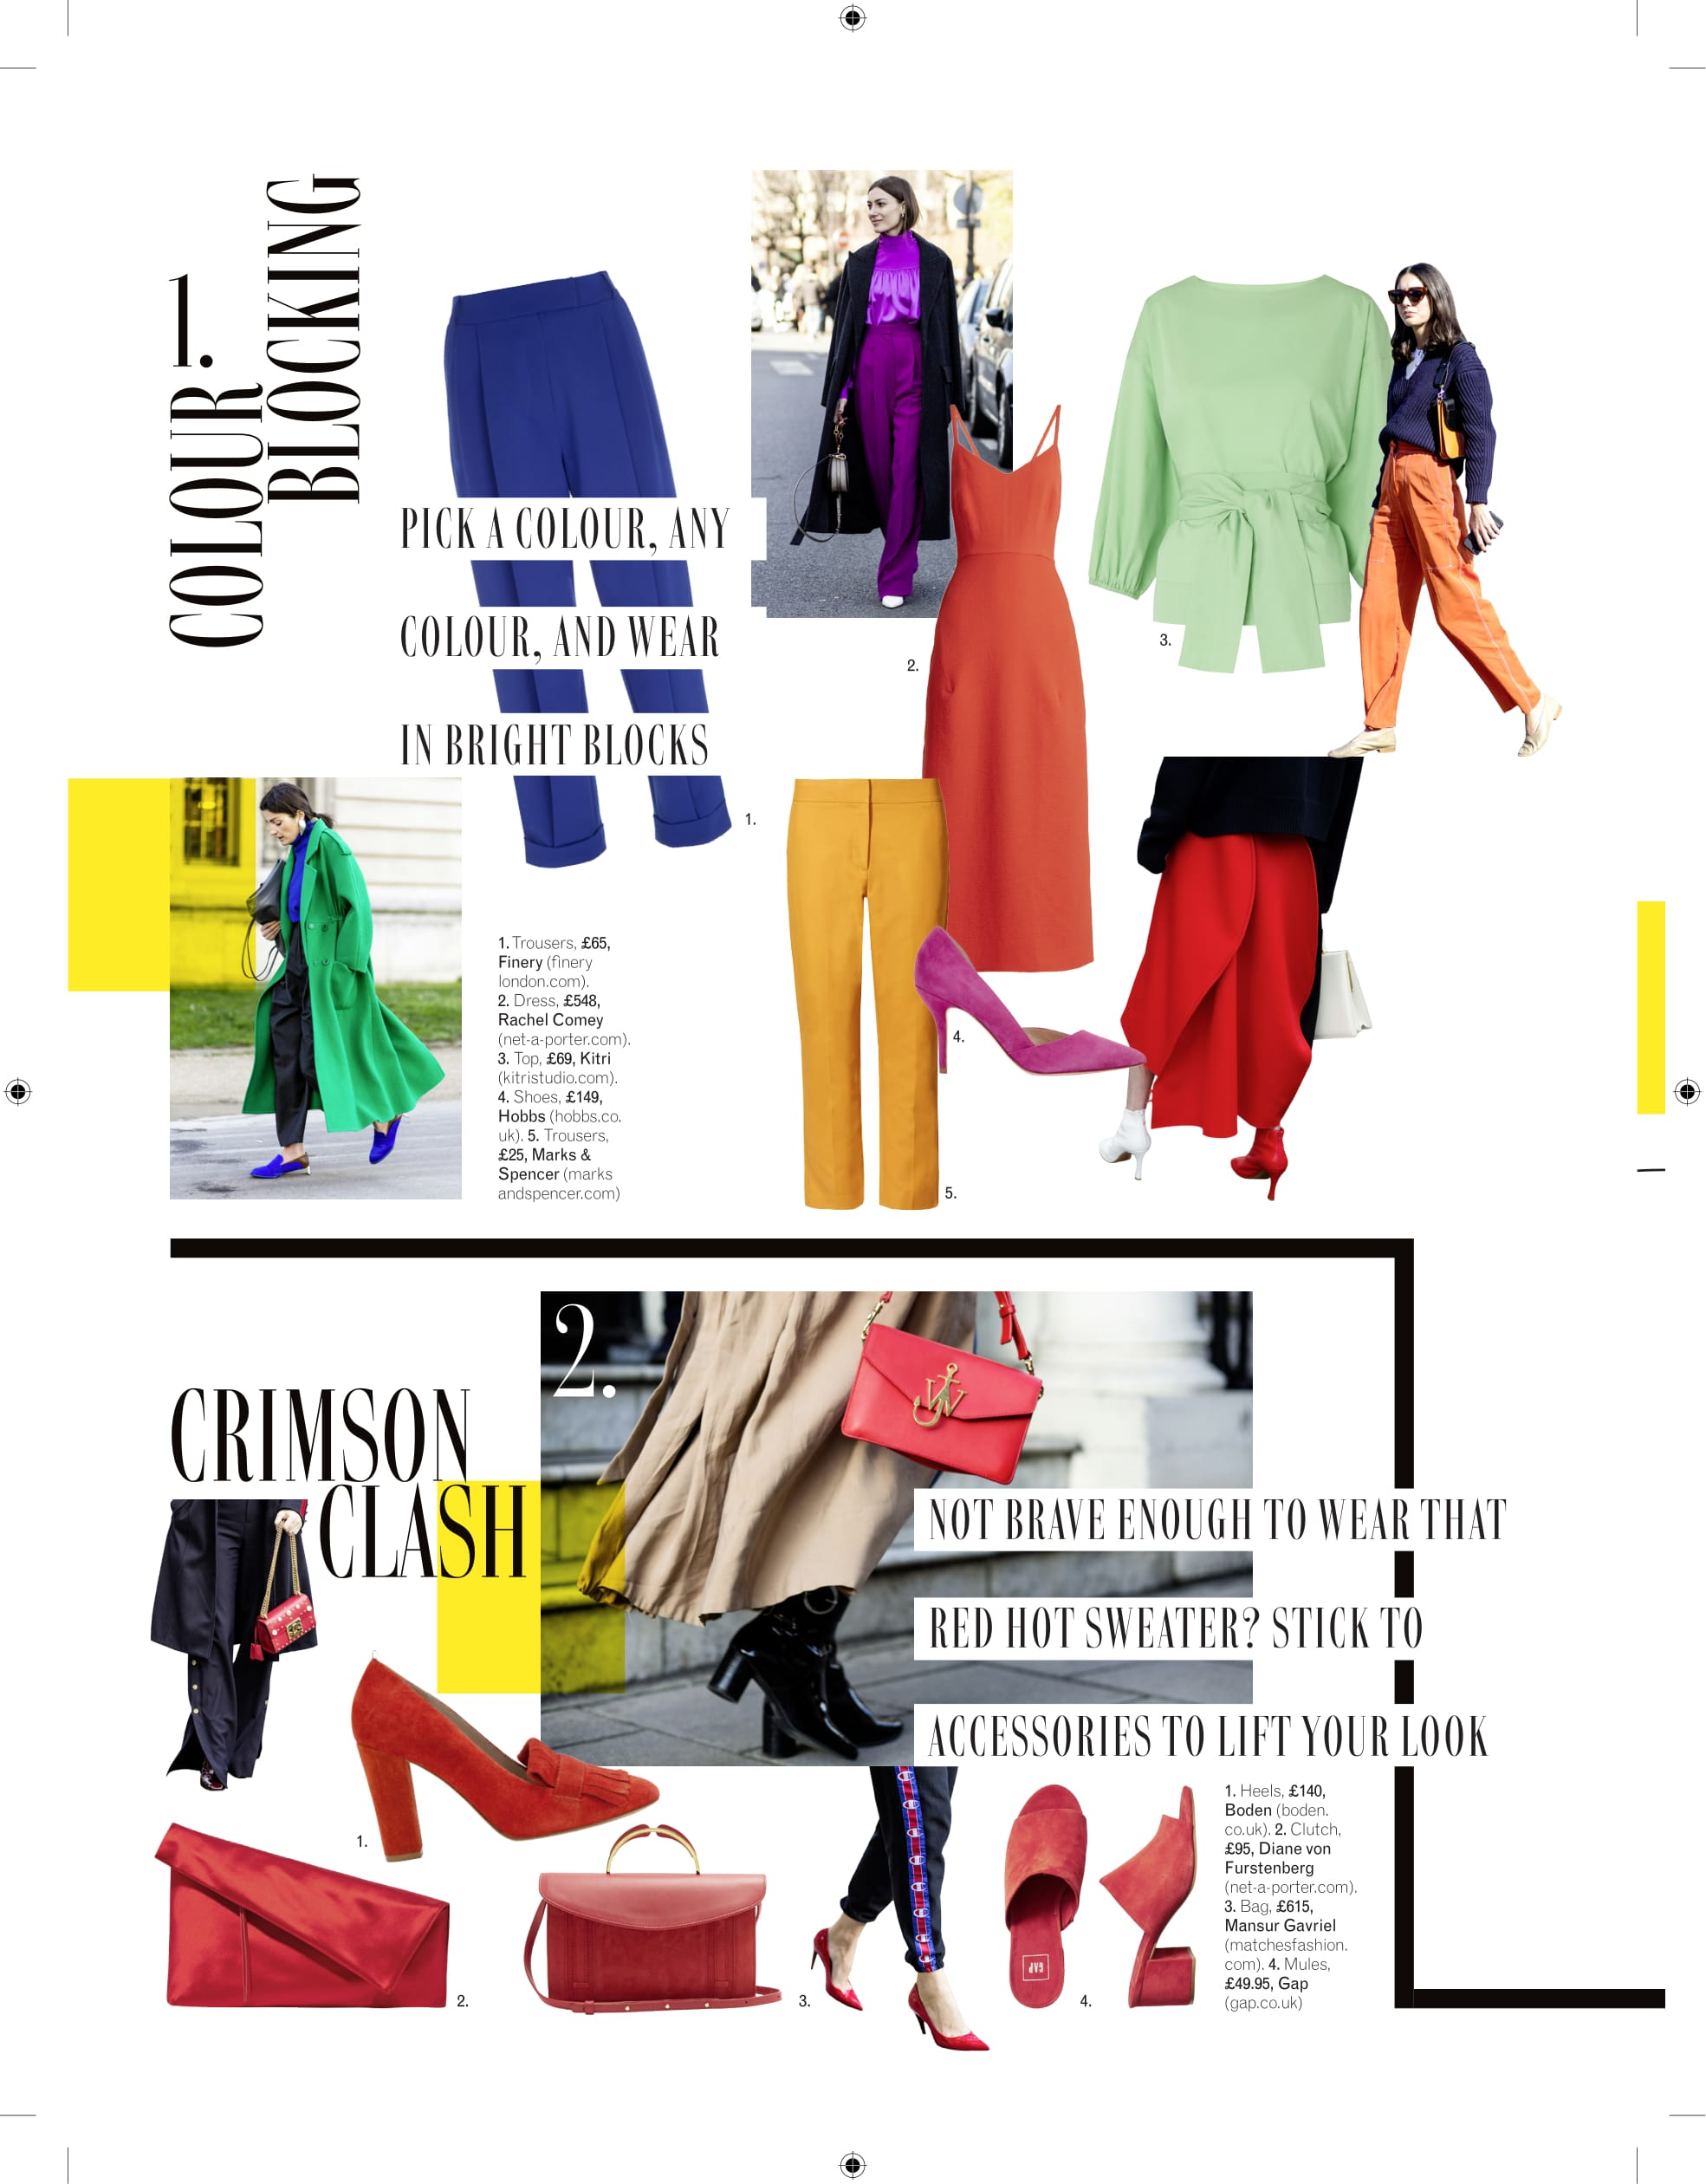 Fashion_STREET STYLE SPESH 6pp_pdf_1-1.jpg